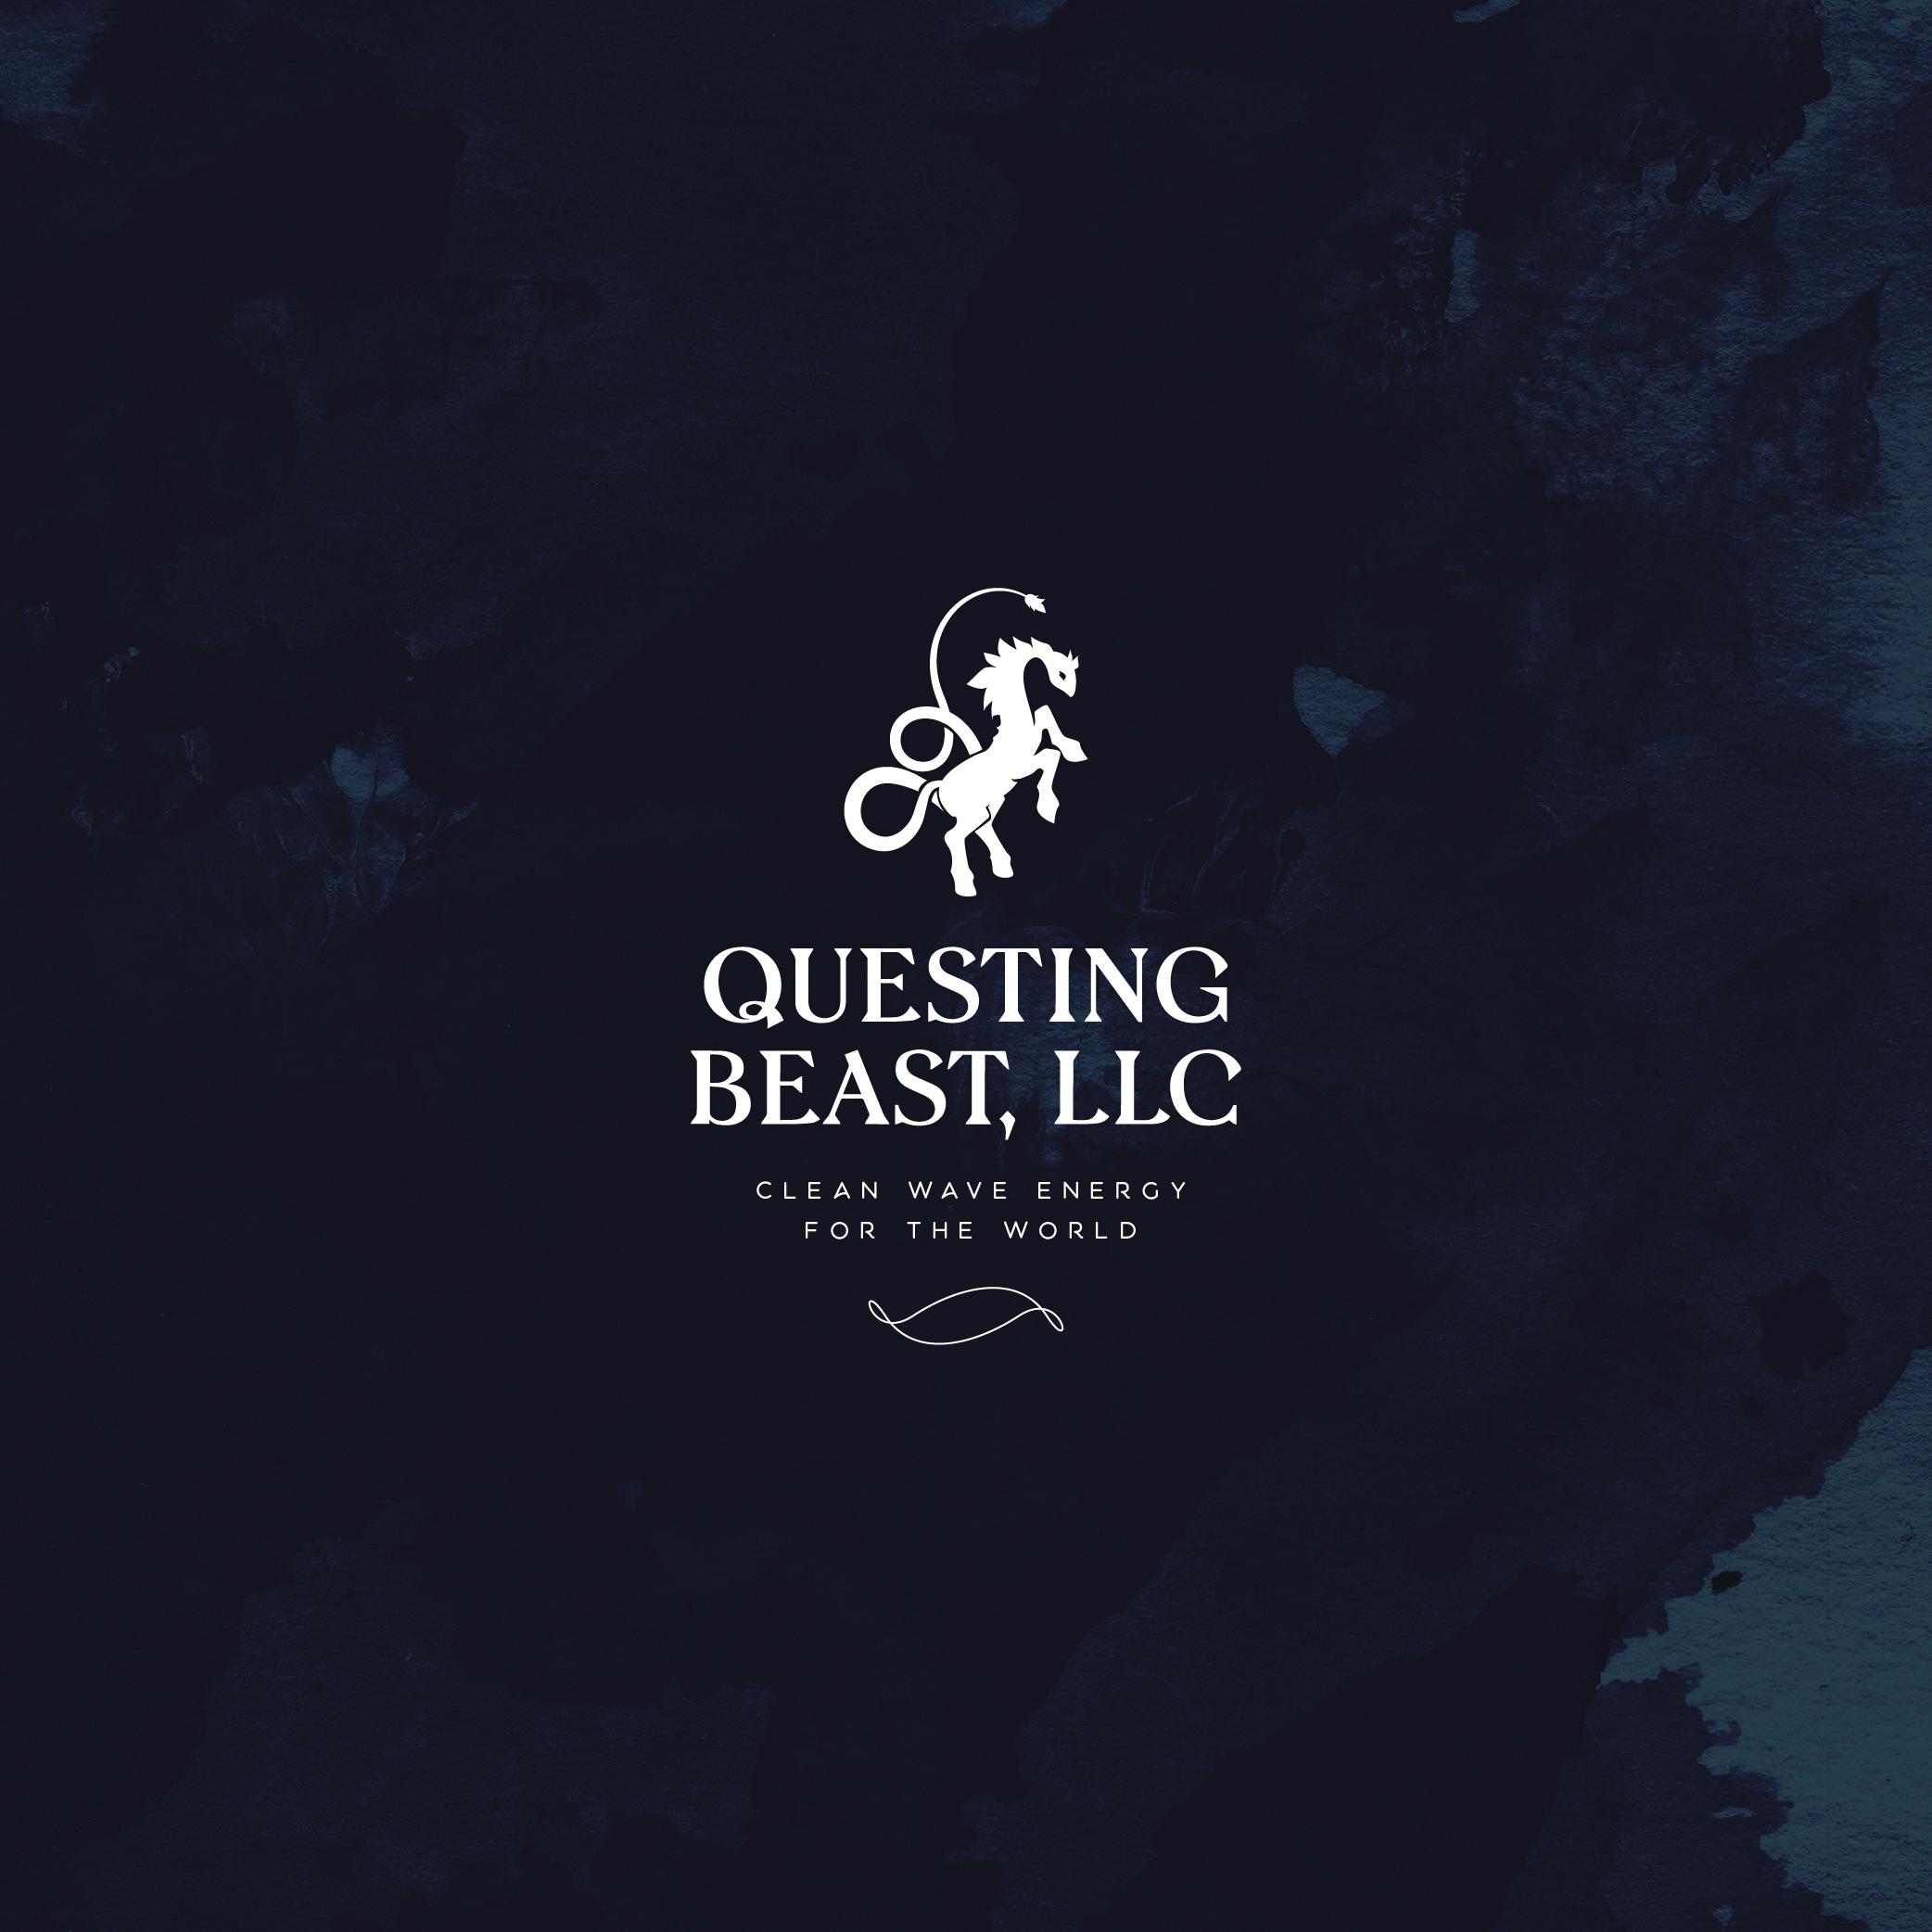 QuestingBeast.jpg